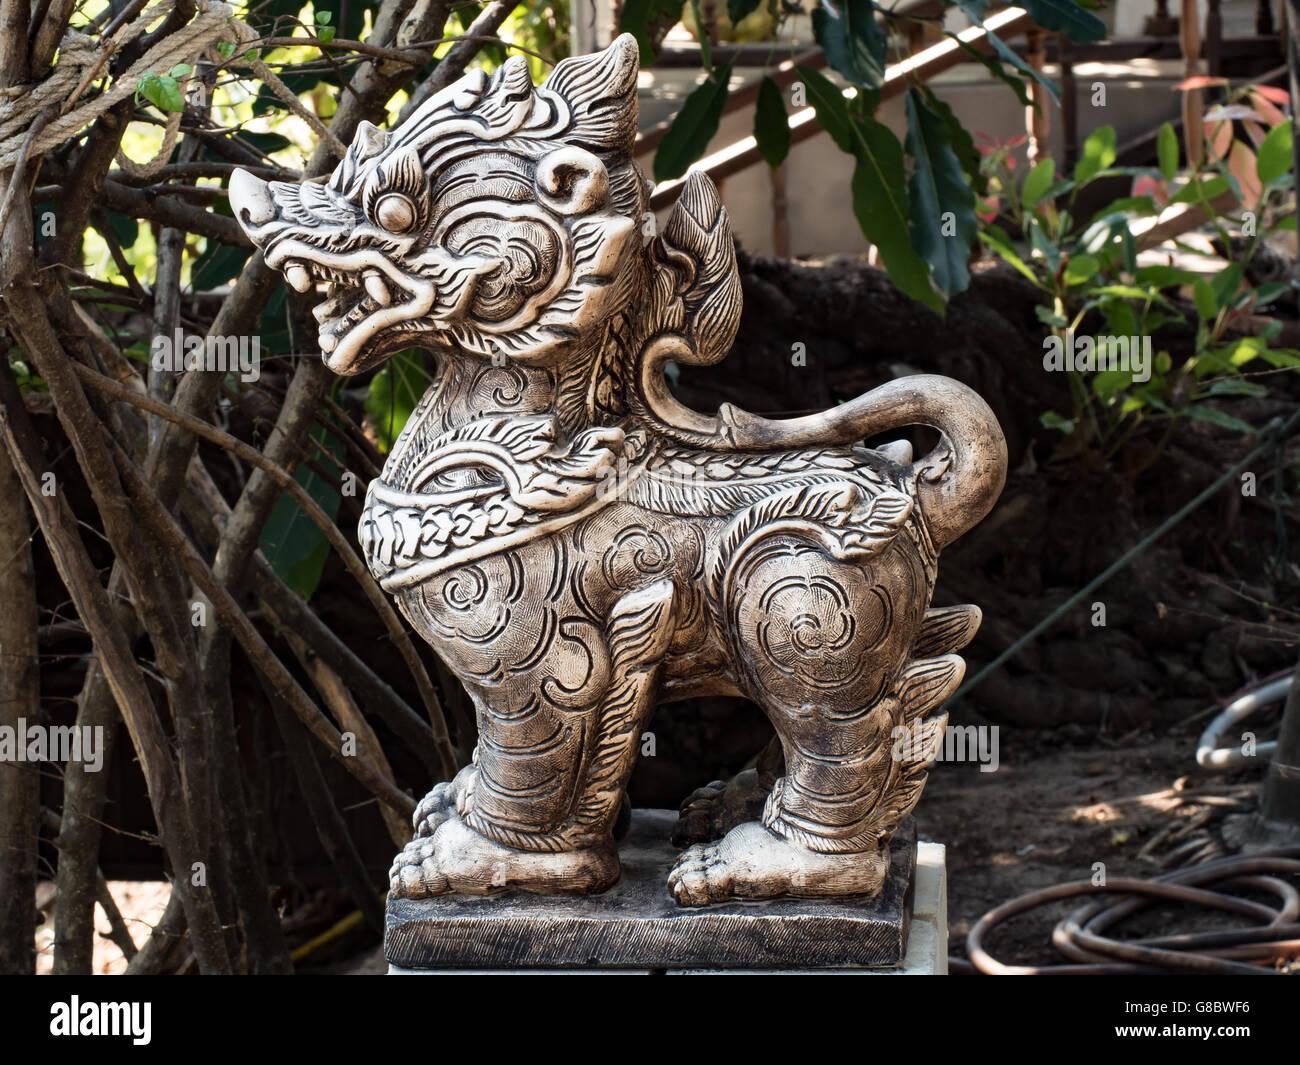 thai,lion,statue,sculpture,molded,figure,statuary,carve,engrave,outdoor,garden,religion - Stock Image